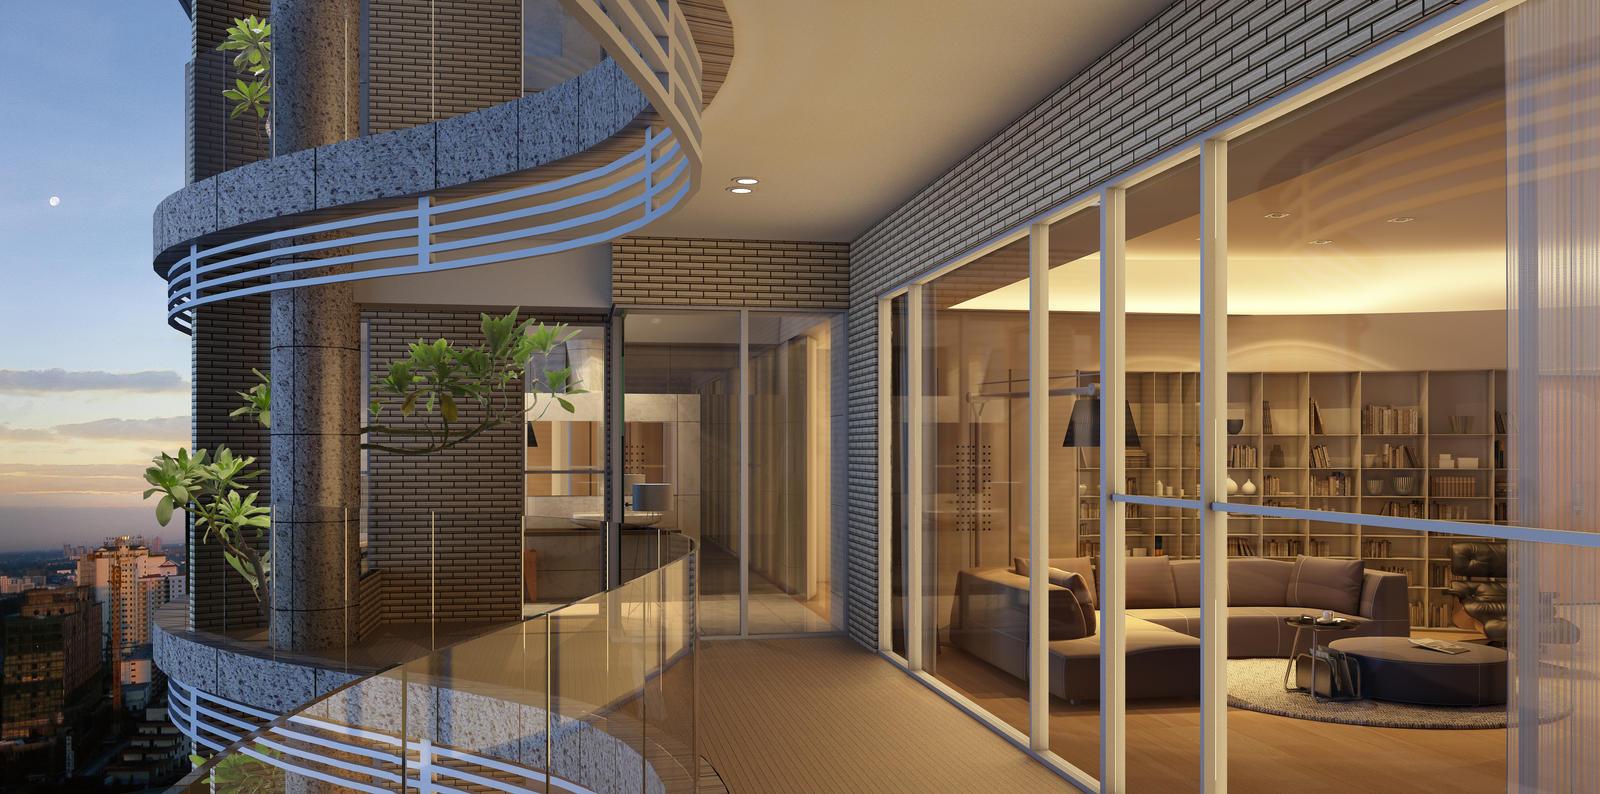 Douglasdao 39 s deviantart gallery for Room design with balcony